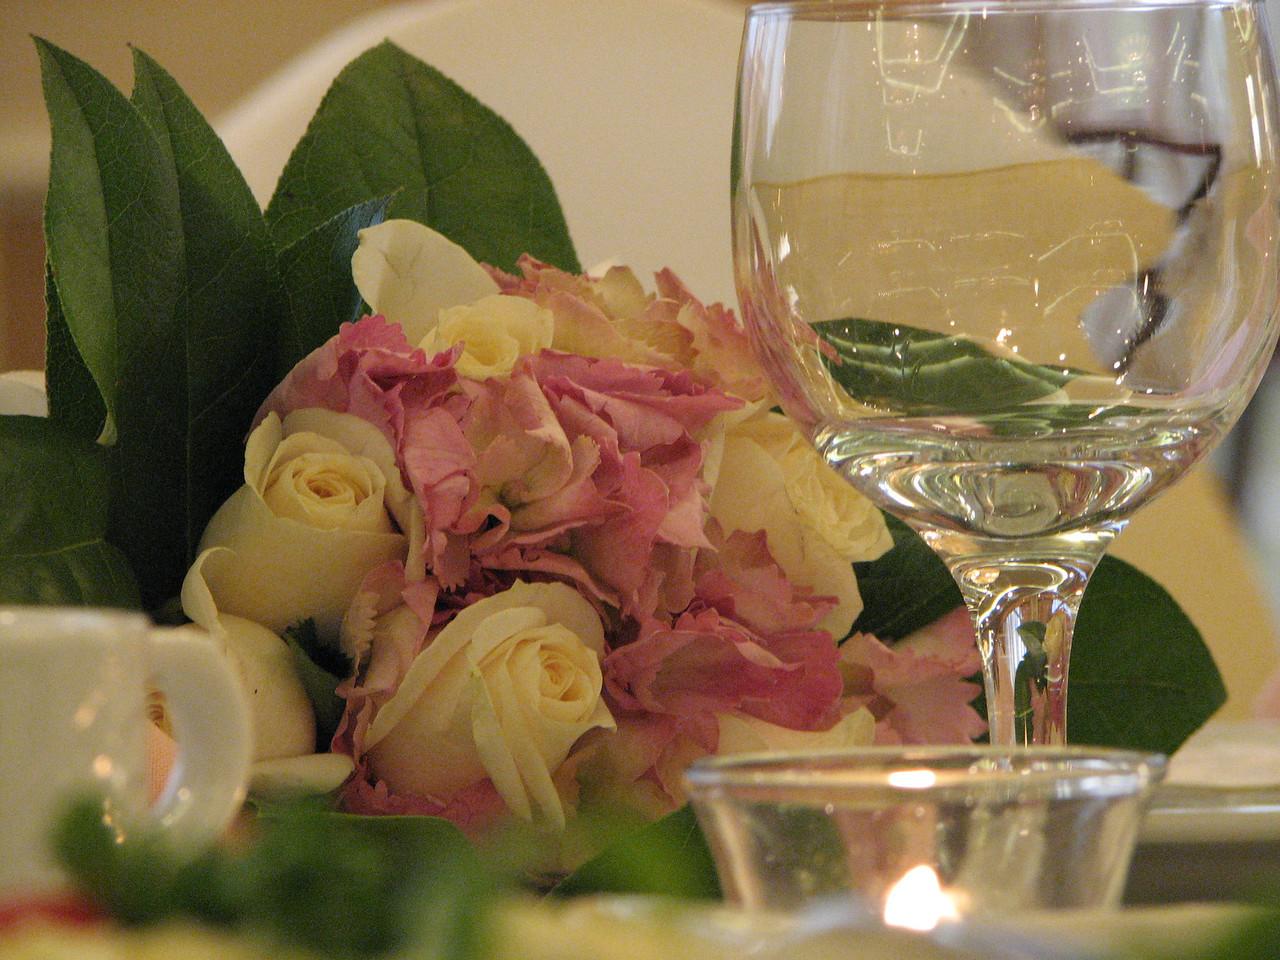 2007 06 09 Sat - Bridal toss bouquet